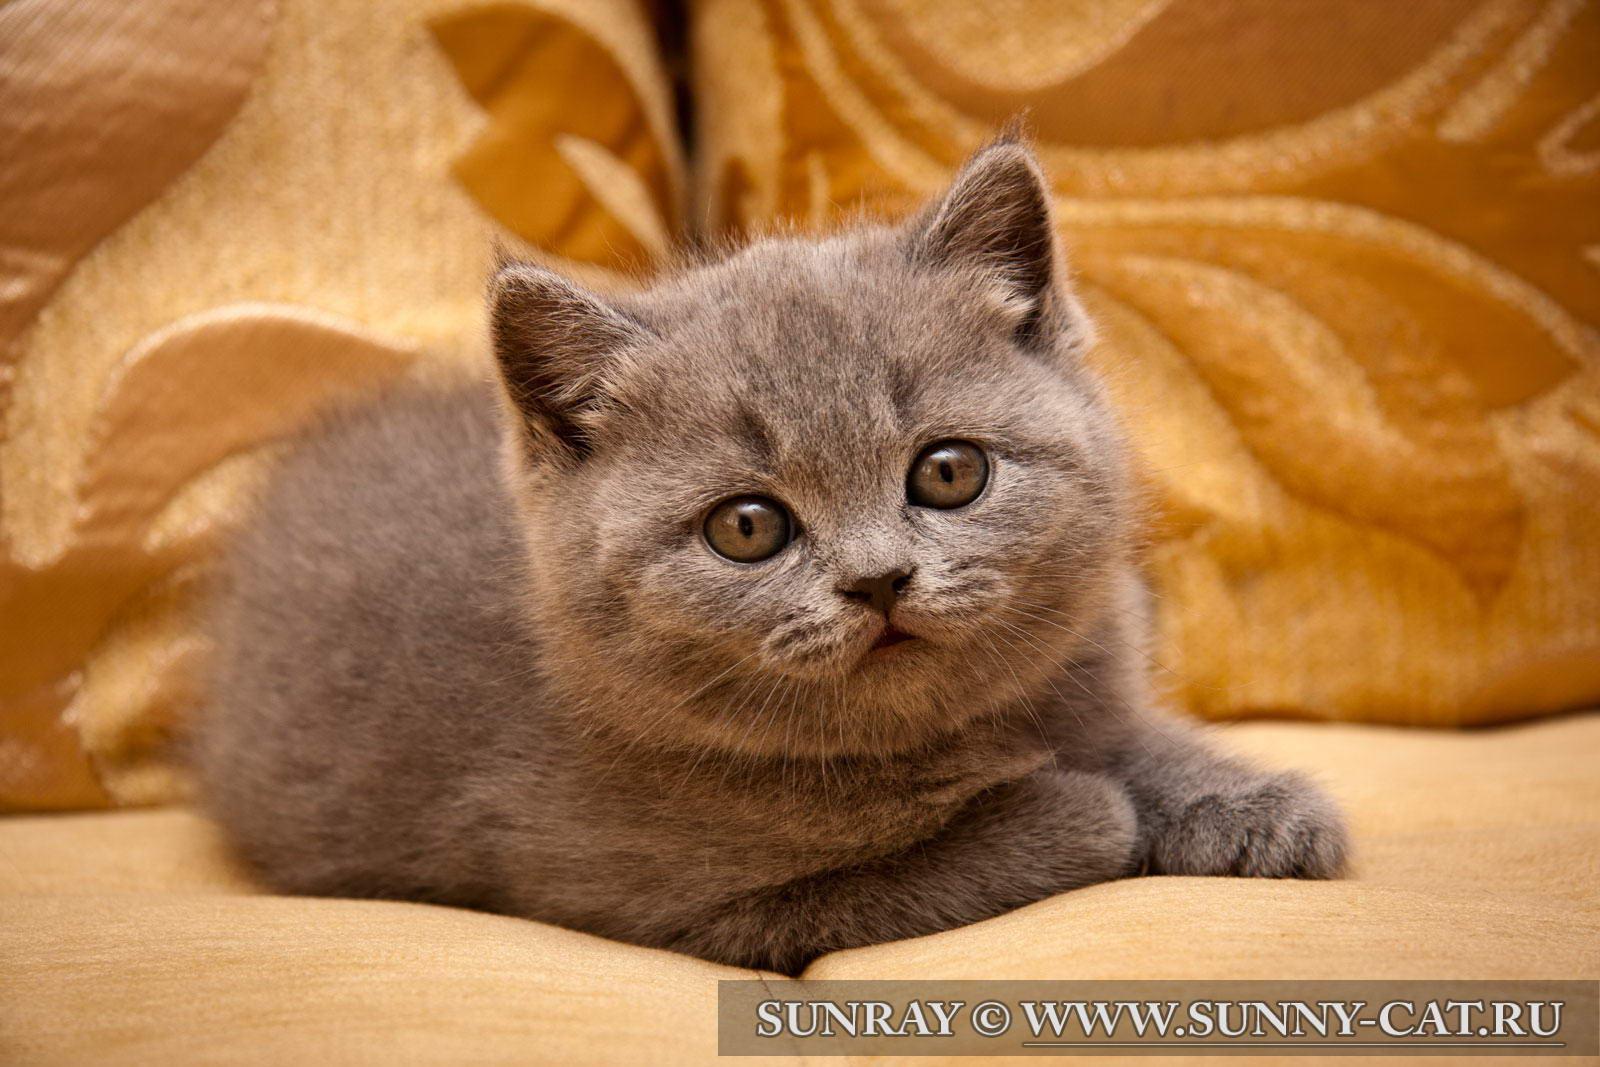 http://www.sunny-cat.ru/datas/users/1-britanskij_kotenok_dominic_sunray_012.jpg